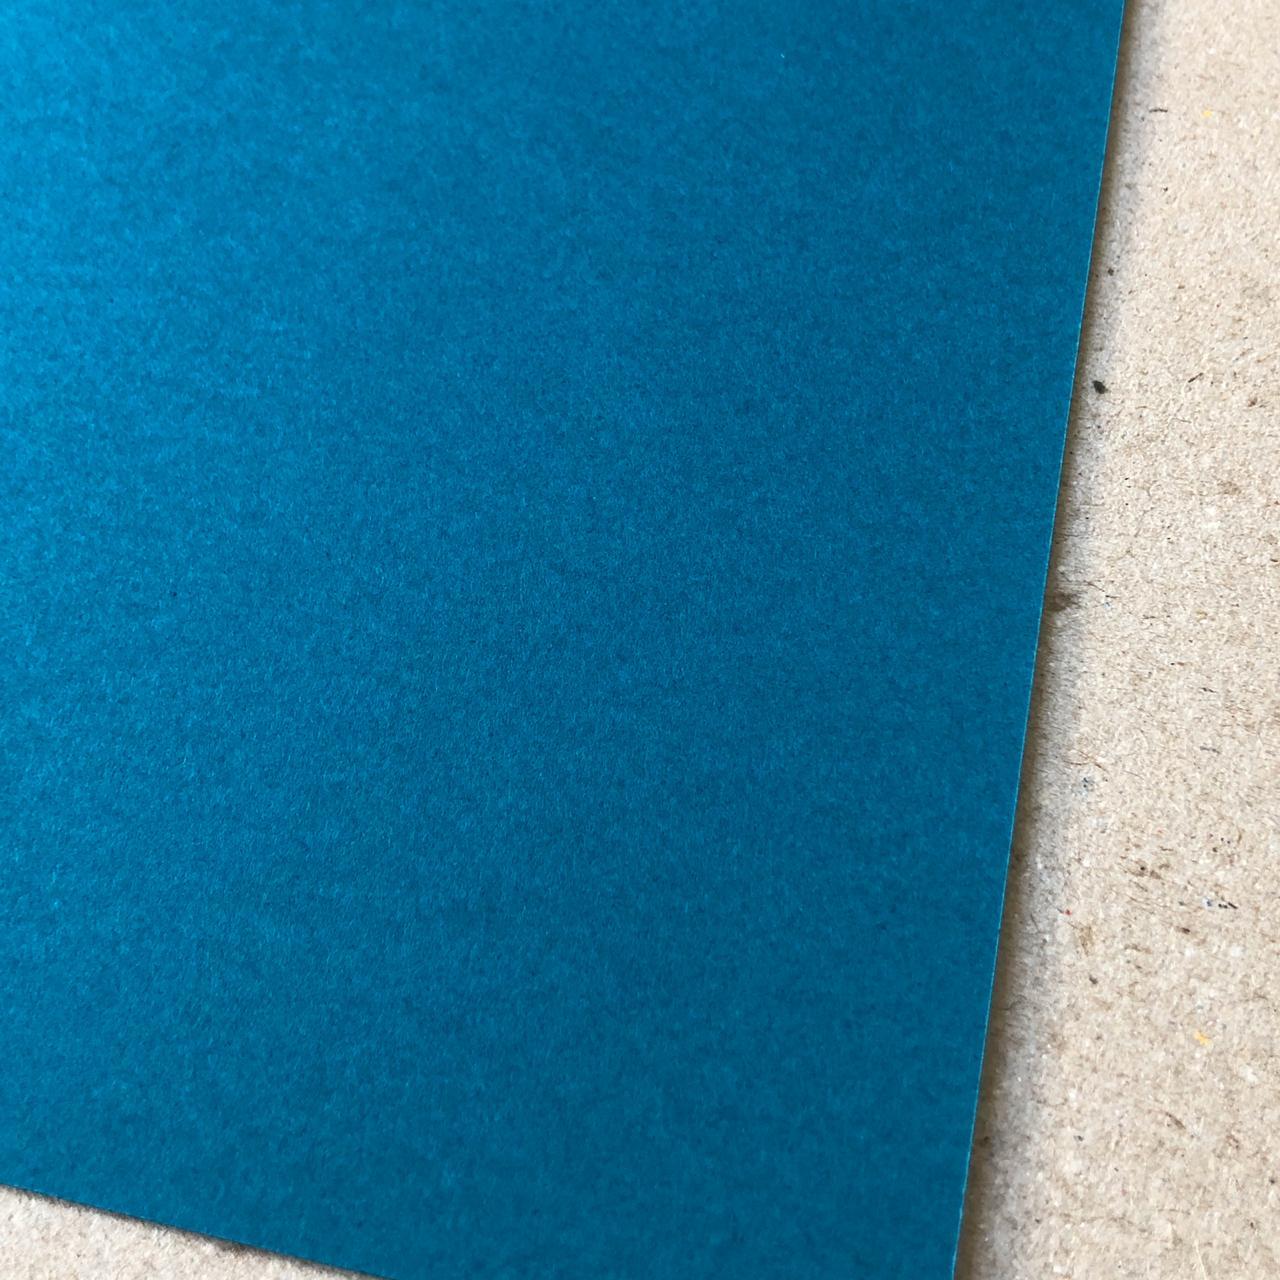 Papel Pop Set - Riviera Blue 180g/m² - 30,5 x 30,5 cm